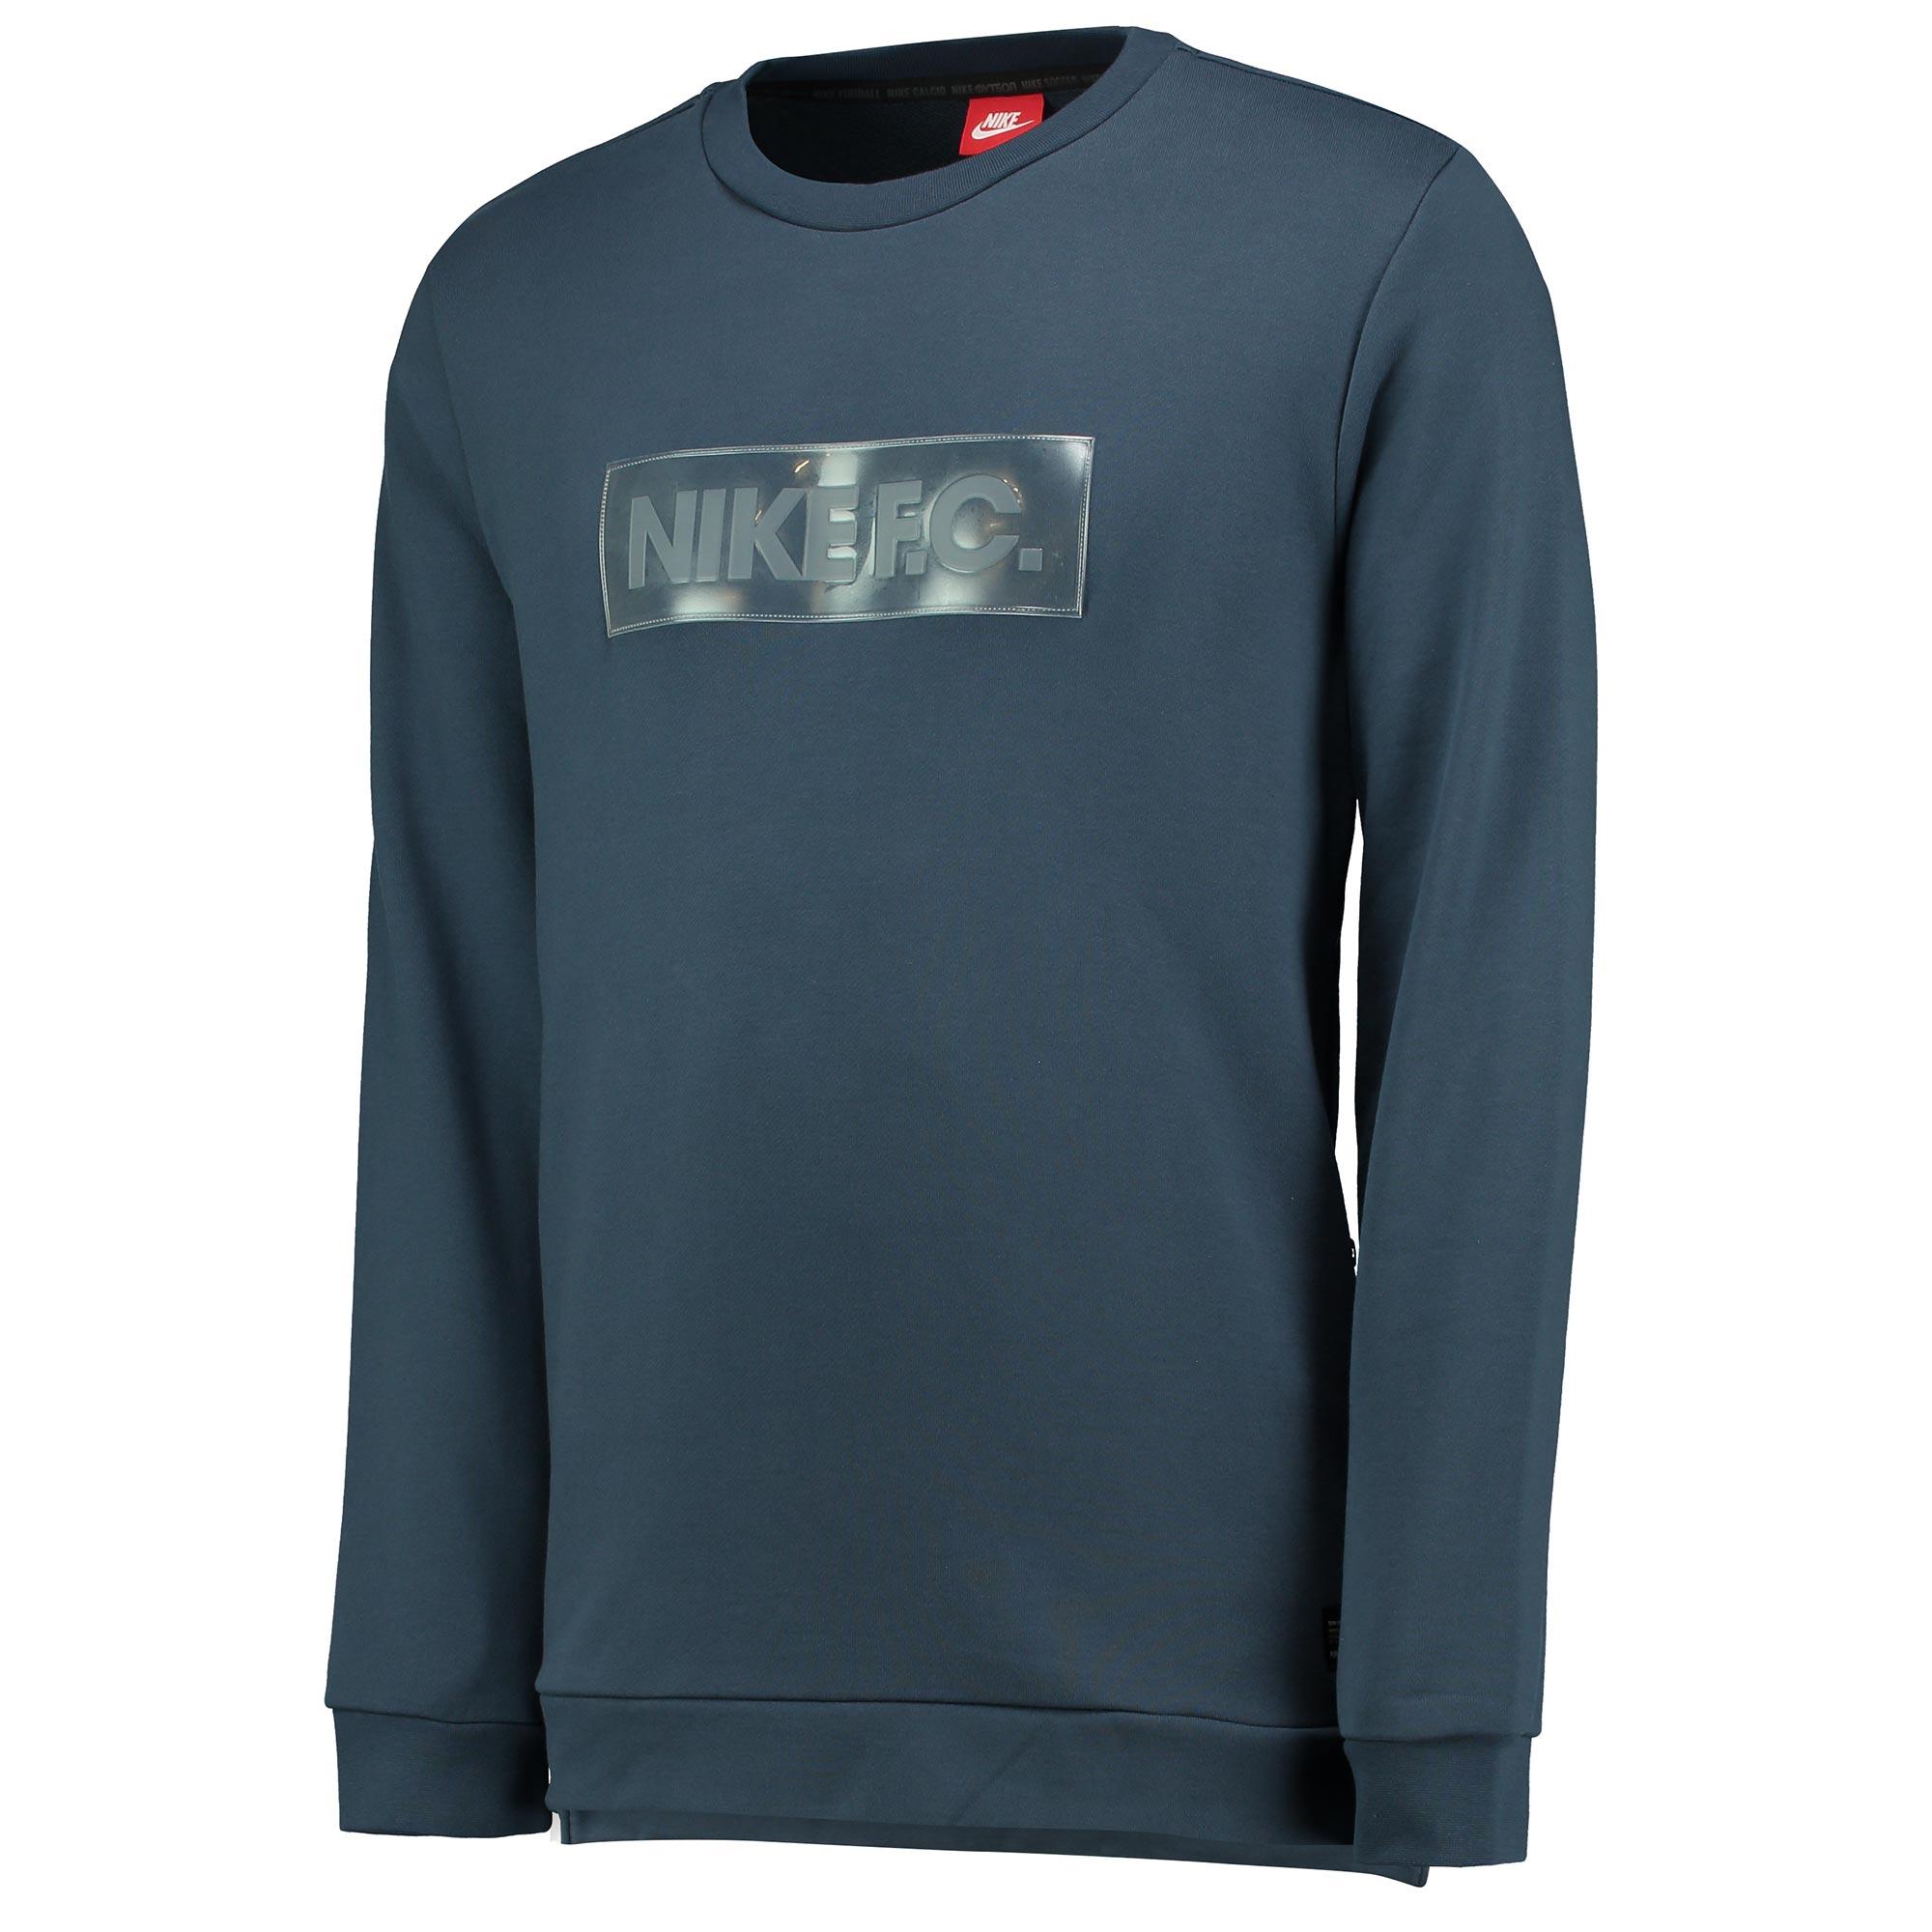 Nike F.C. Crew Sweater - Squadron Blue